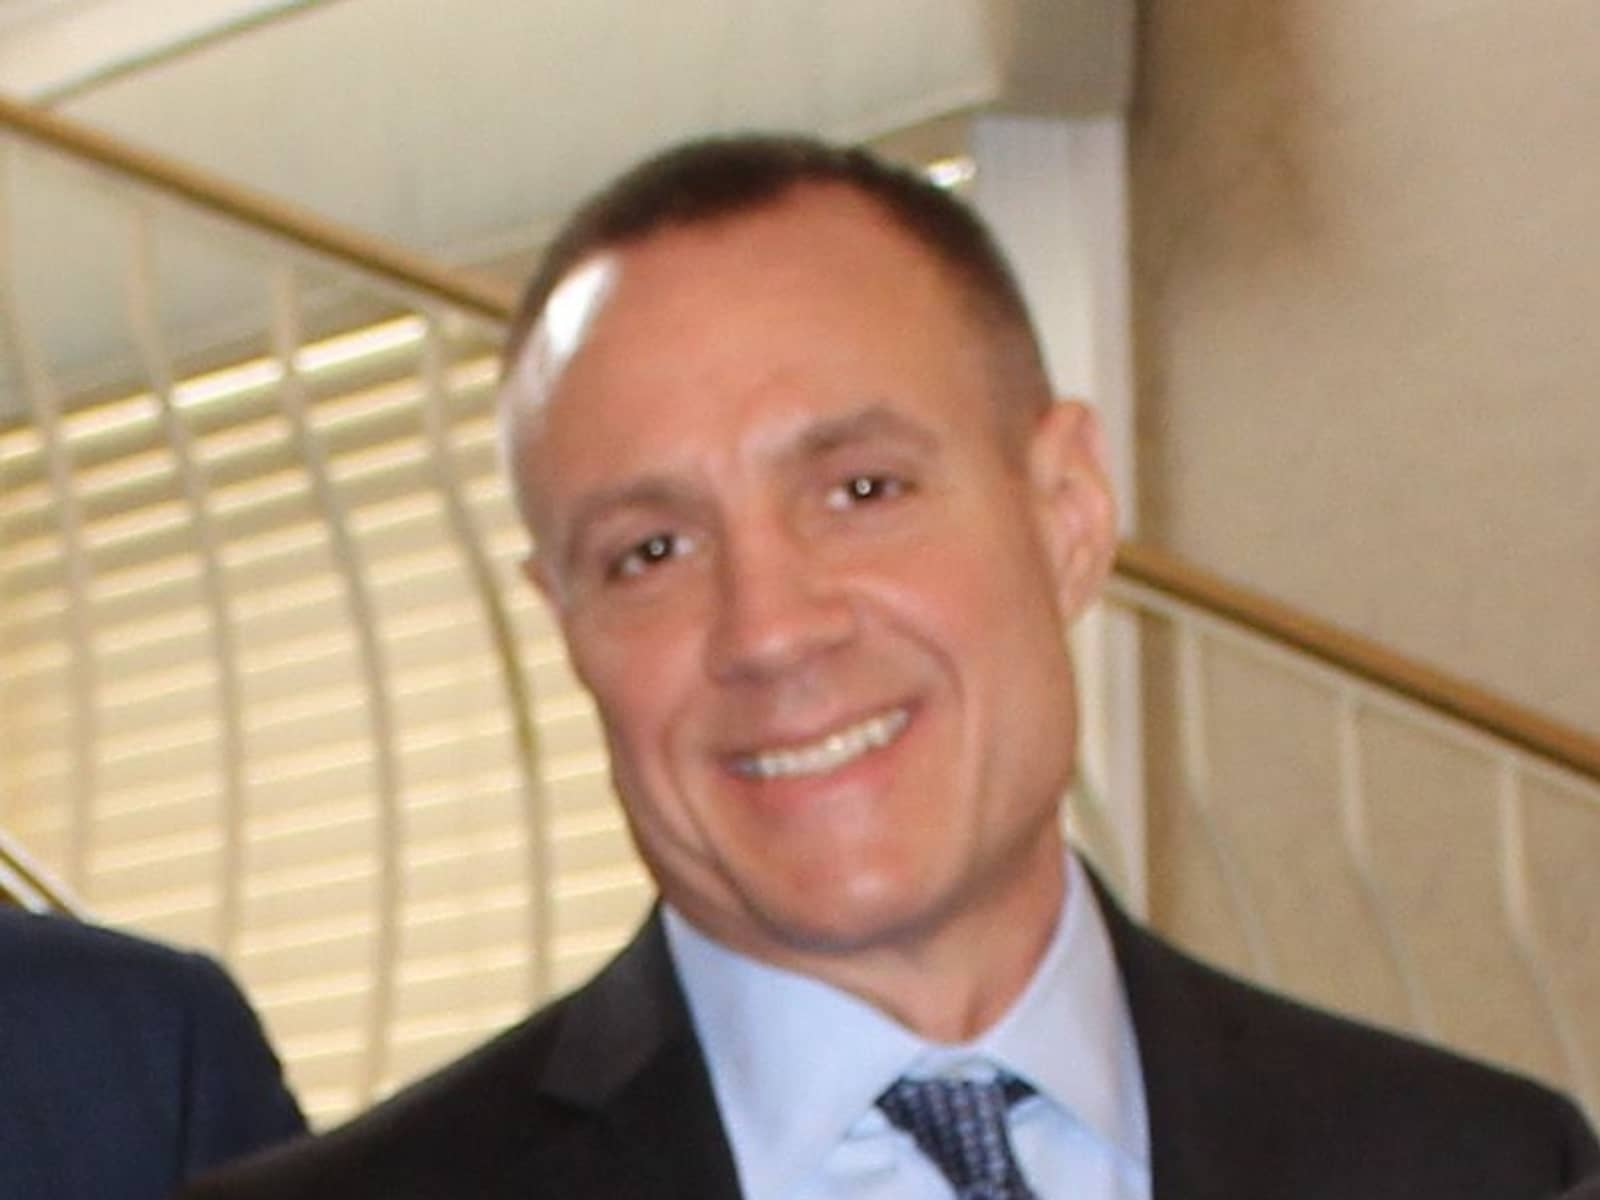 David from Dallas, Texas, United States